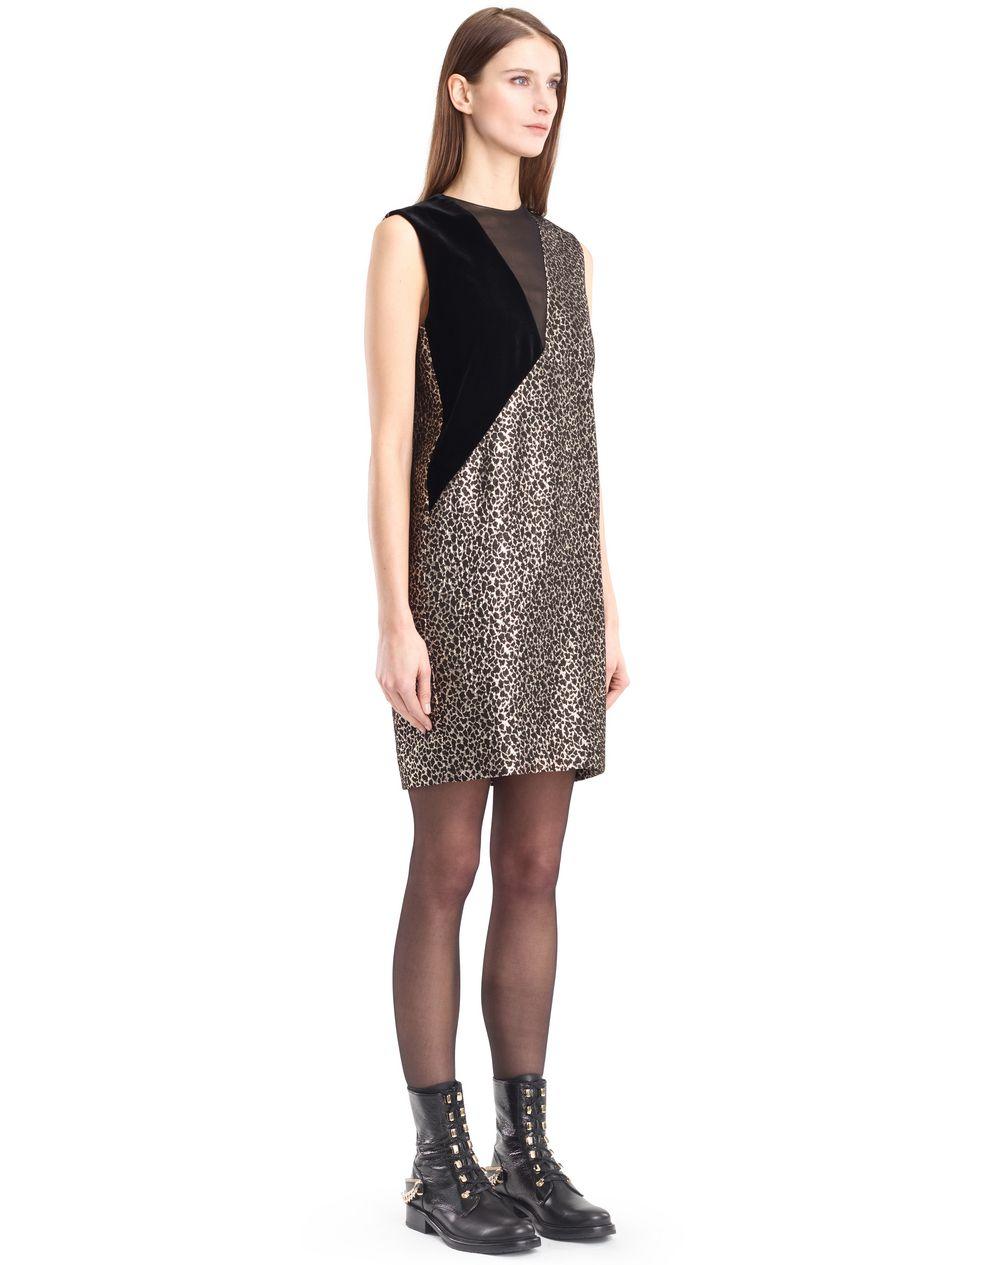 GOLDEN LEOPARD DRESS - Lanvin